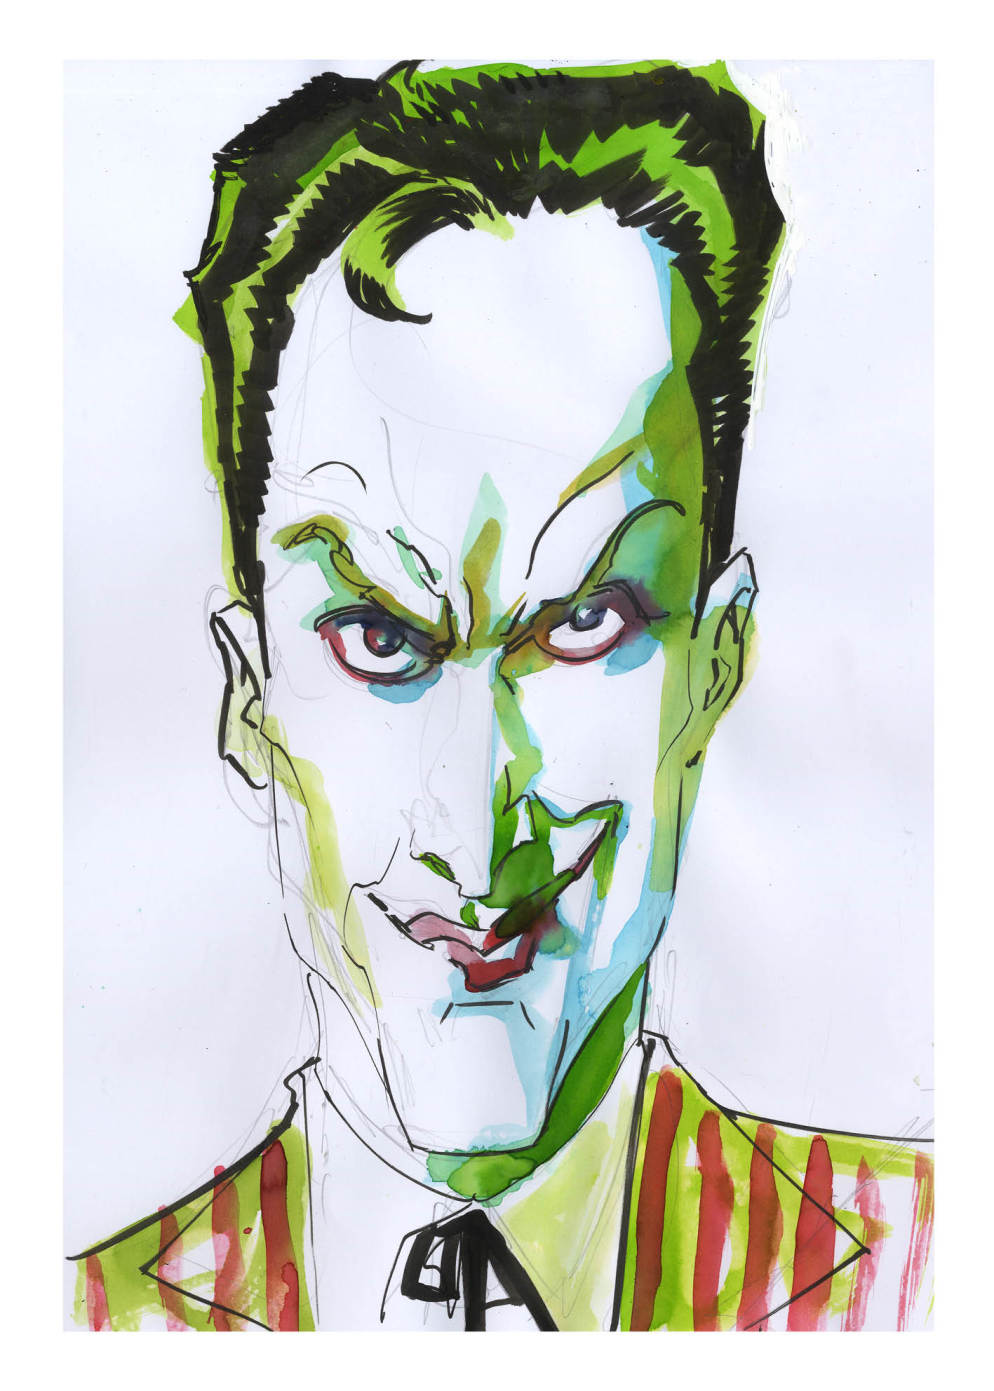 Joker_MCM_print_50x70cm